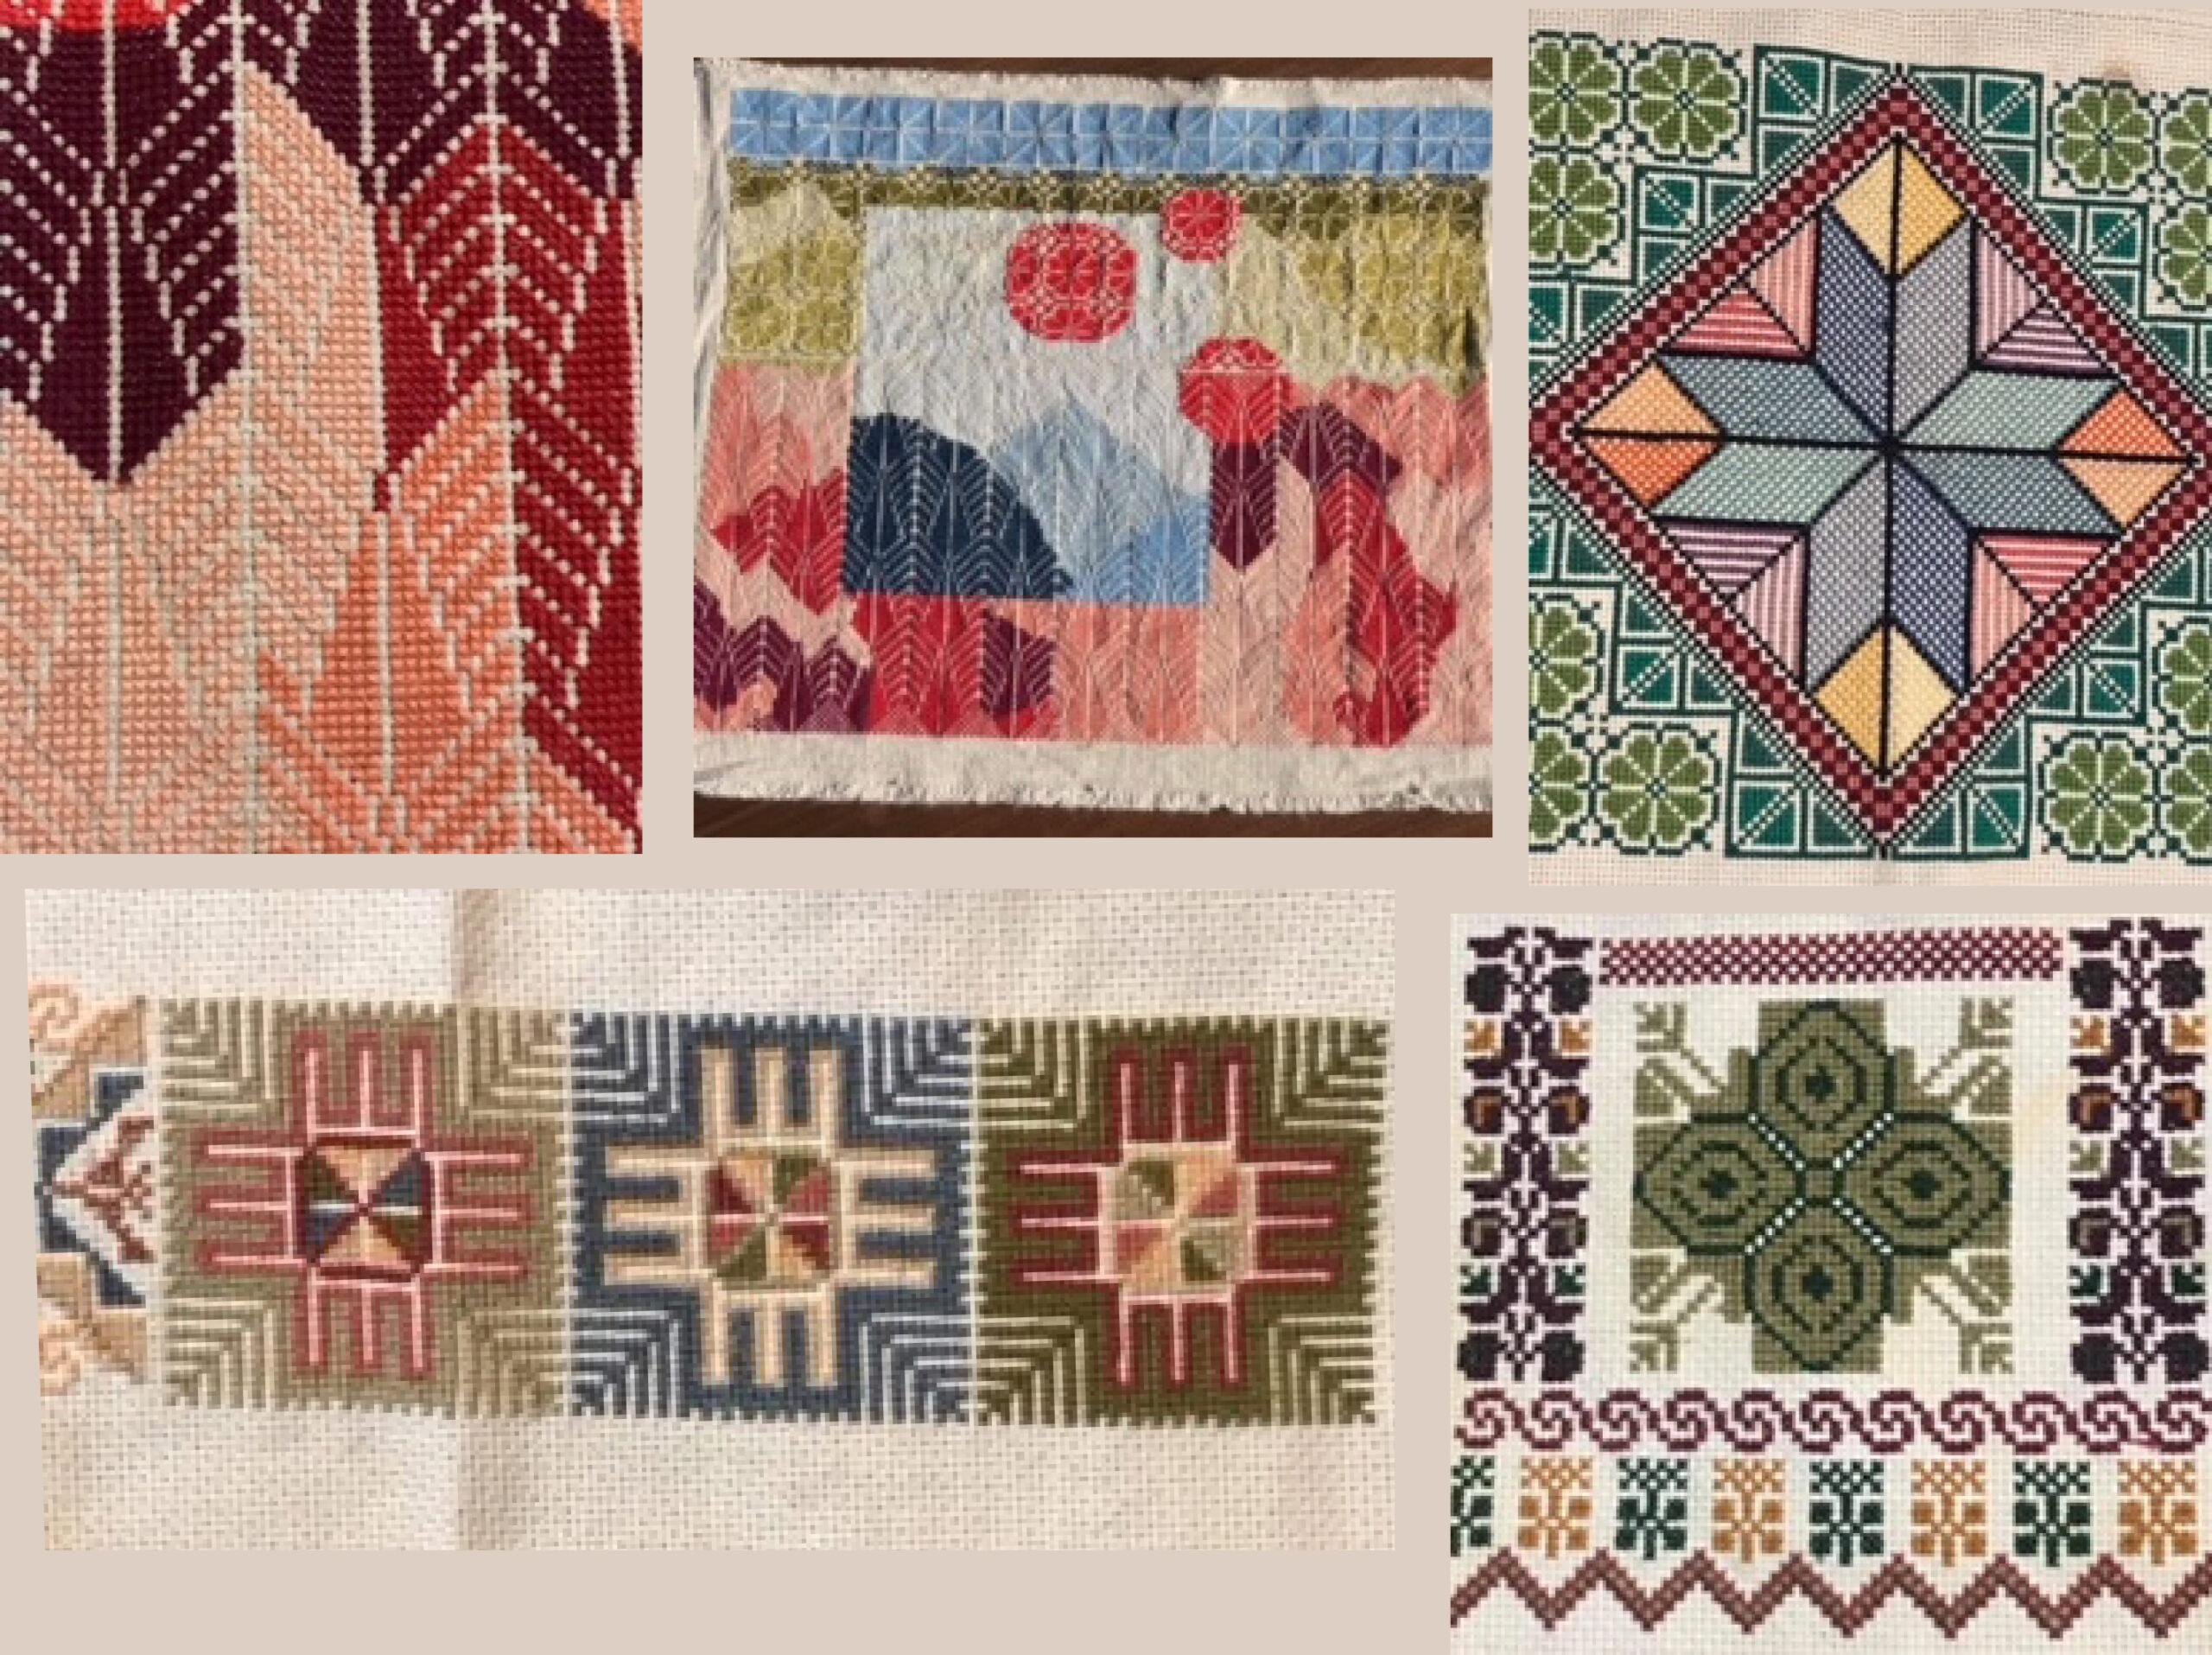 jenna-embroidery-scaled